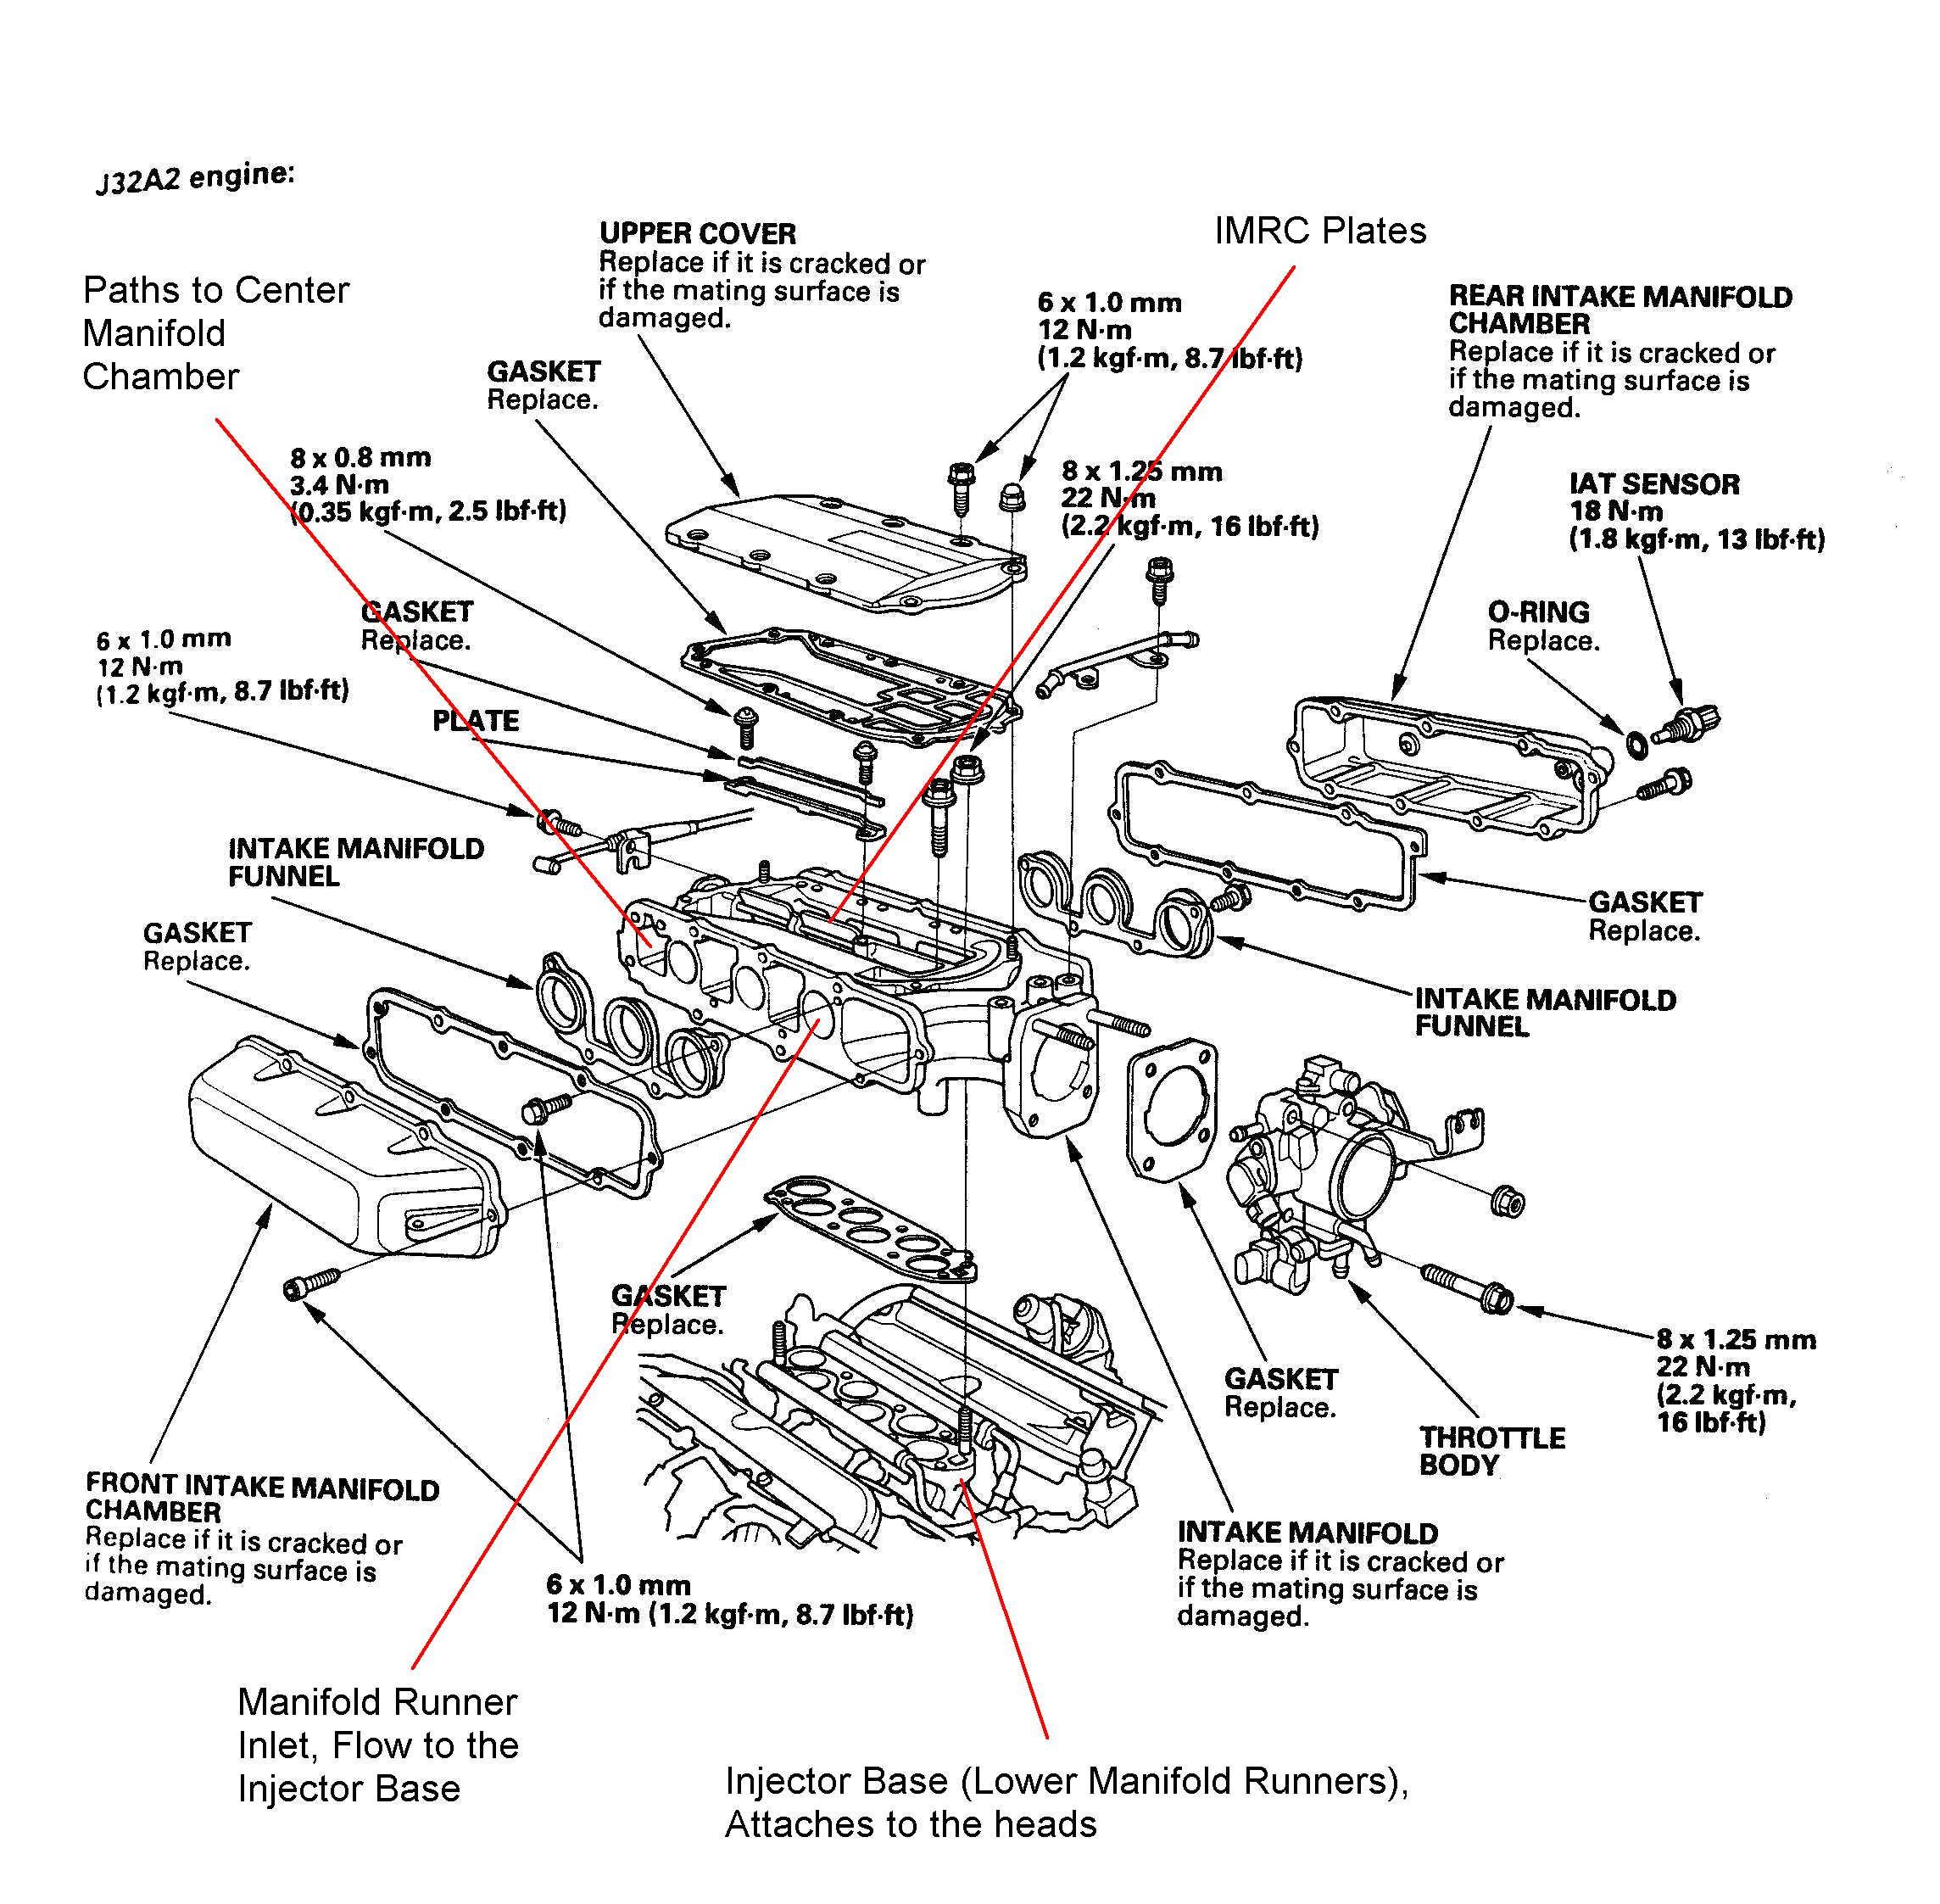 2002 Acura Tl Engine Diagram Frigidaire Valve Wiring Diagram Gravely Yenpancane Jeanjaures37 Fr